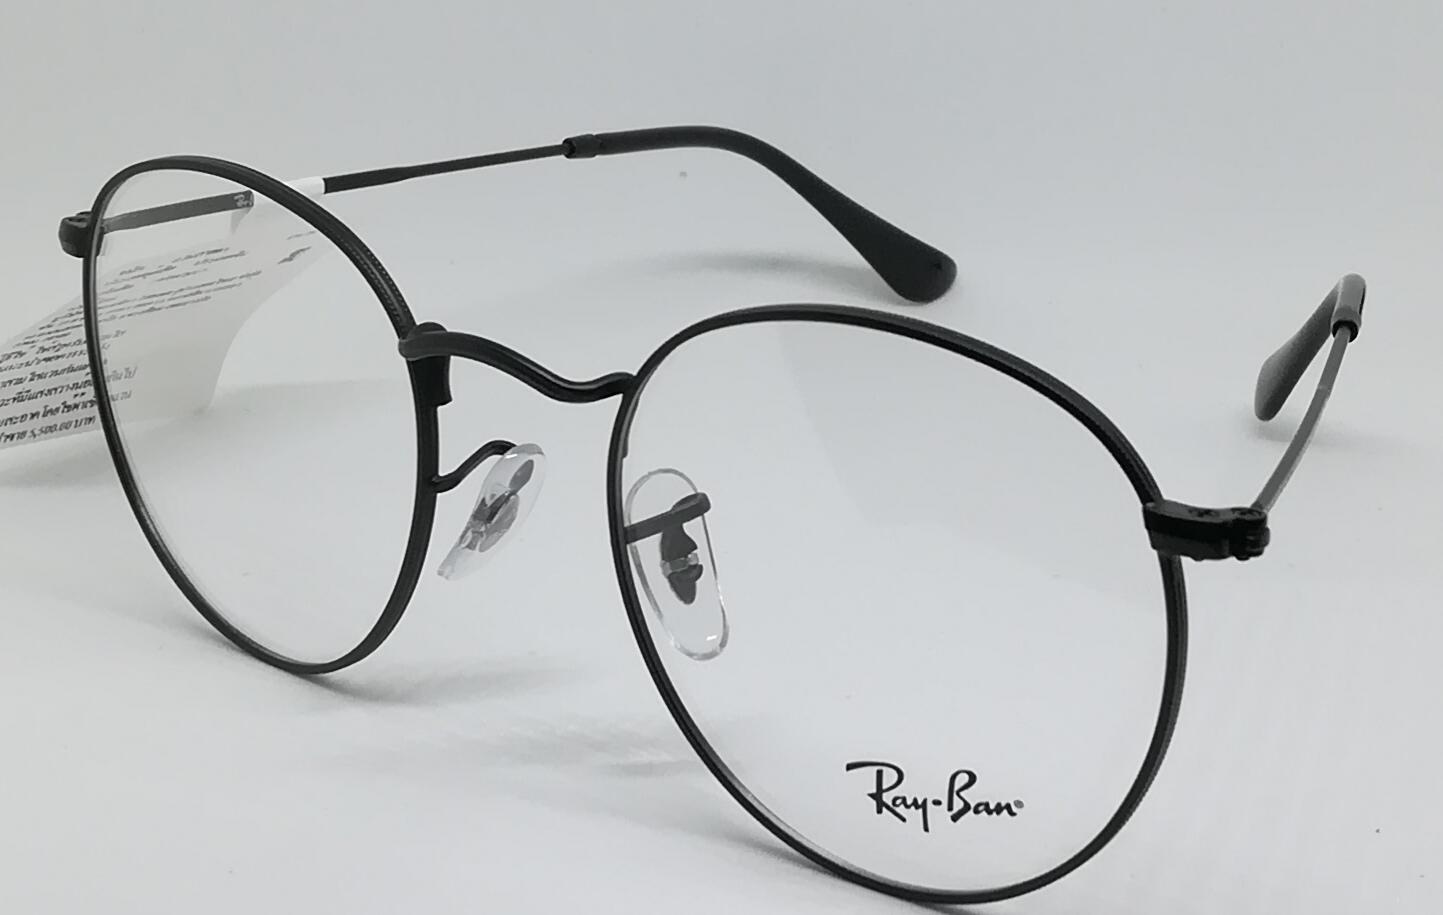 Rayban RX3477V 2503 50